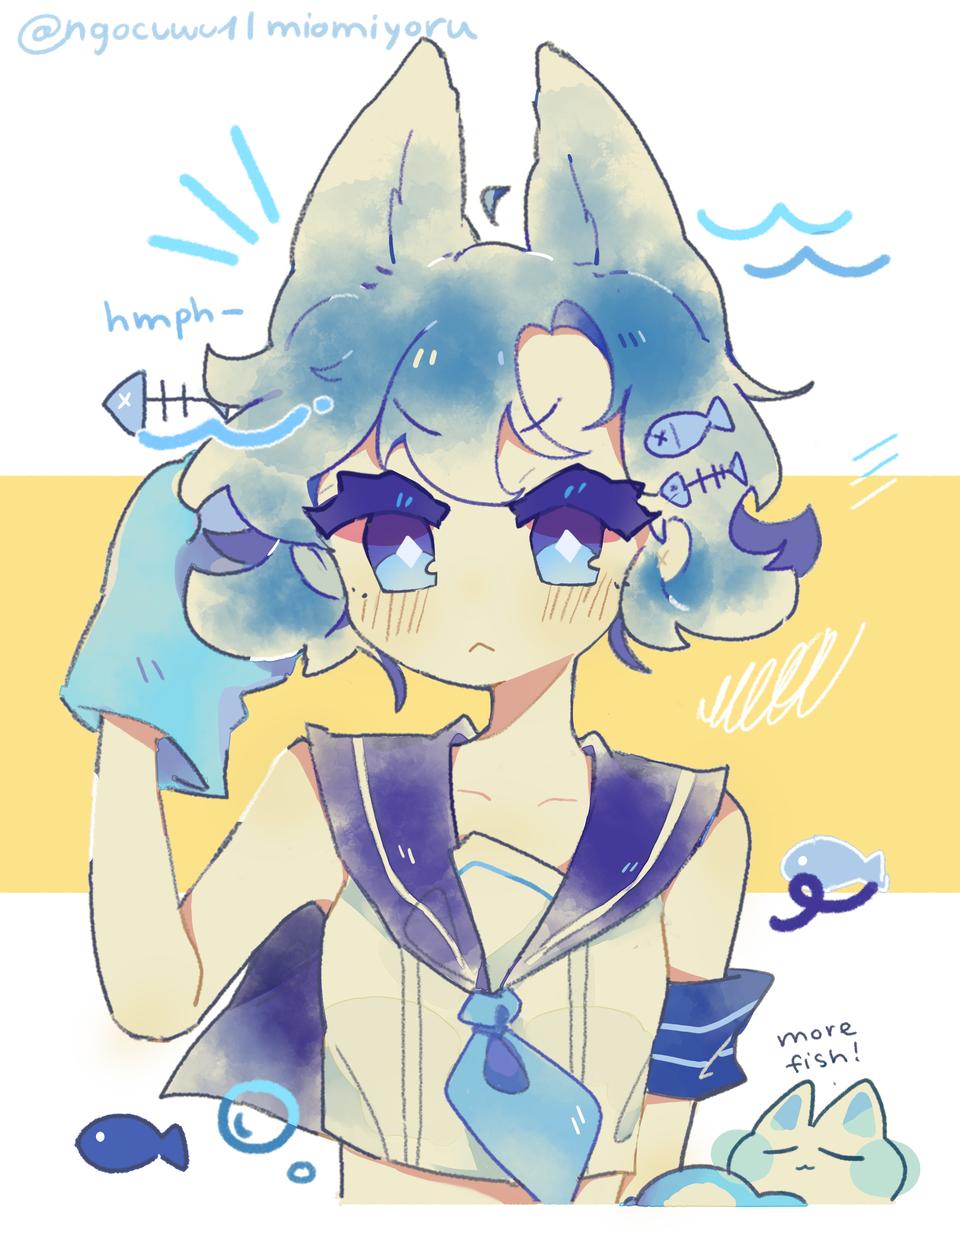 Blue catto (=^・ω・^=) Illust of Mio Miyoru blue なんか色の塗り方がいい cat beautiful cute cat_ears girl colorsketch digital art